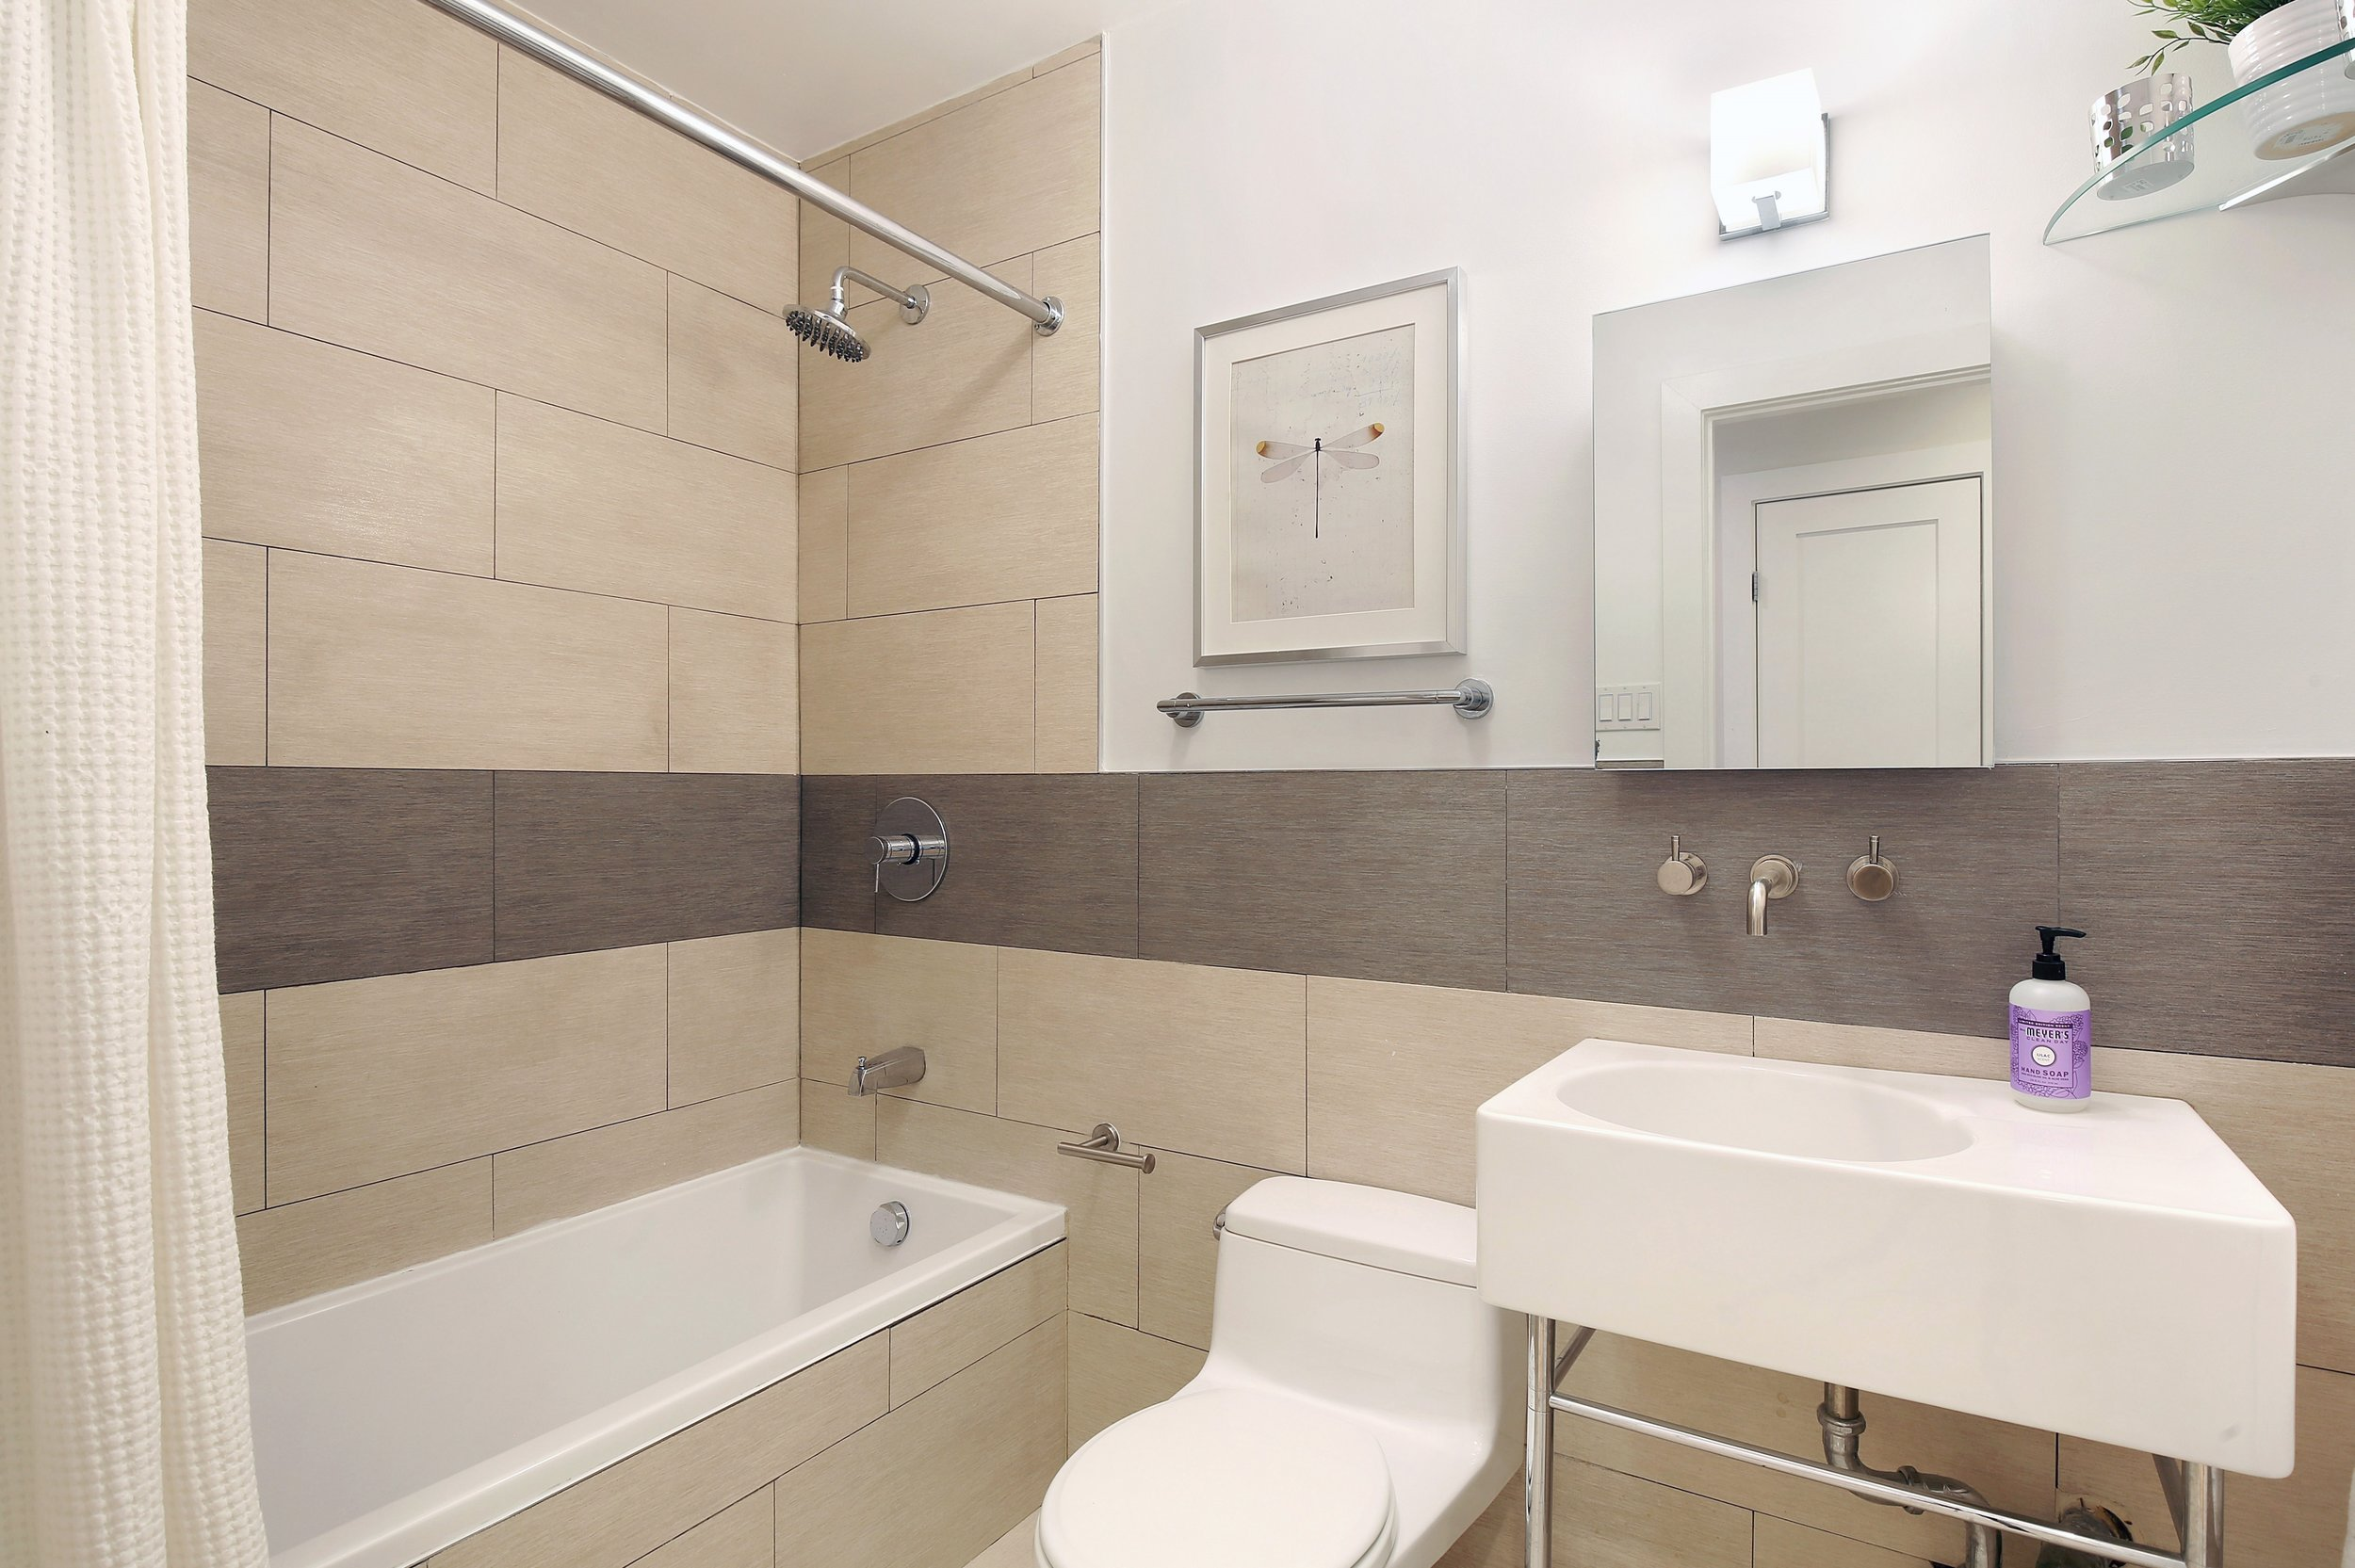 06_321UnionStreet_3B_8_Bathroom_HiRes.jpg